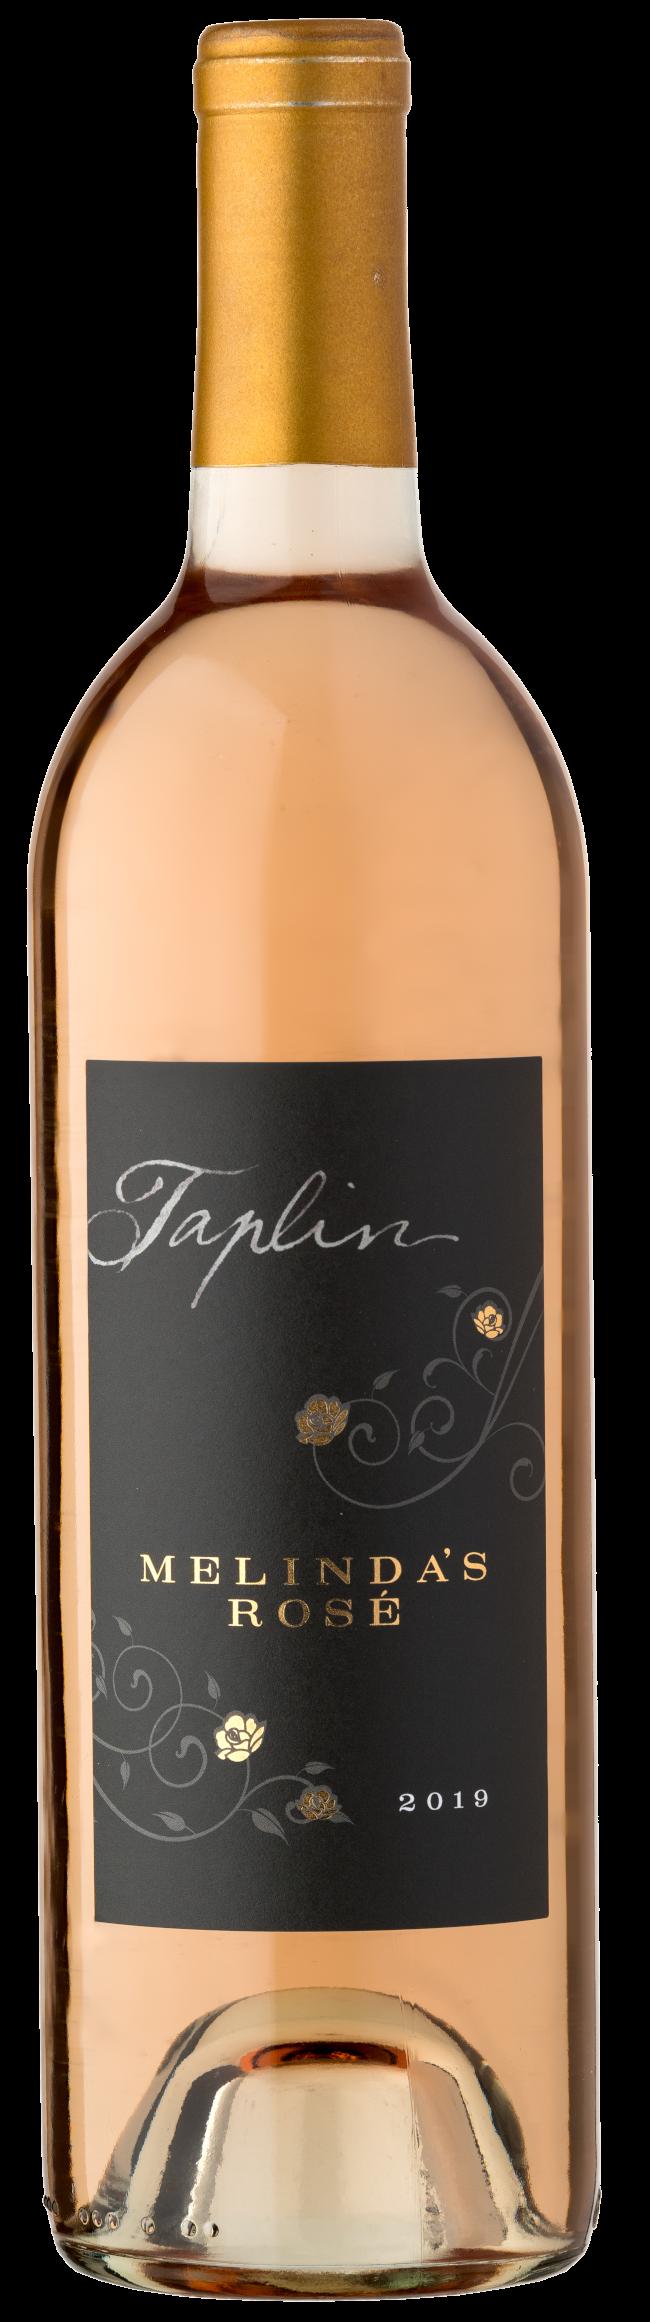 Melinda's Rosé bottle